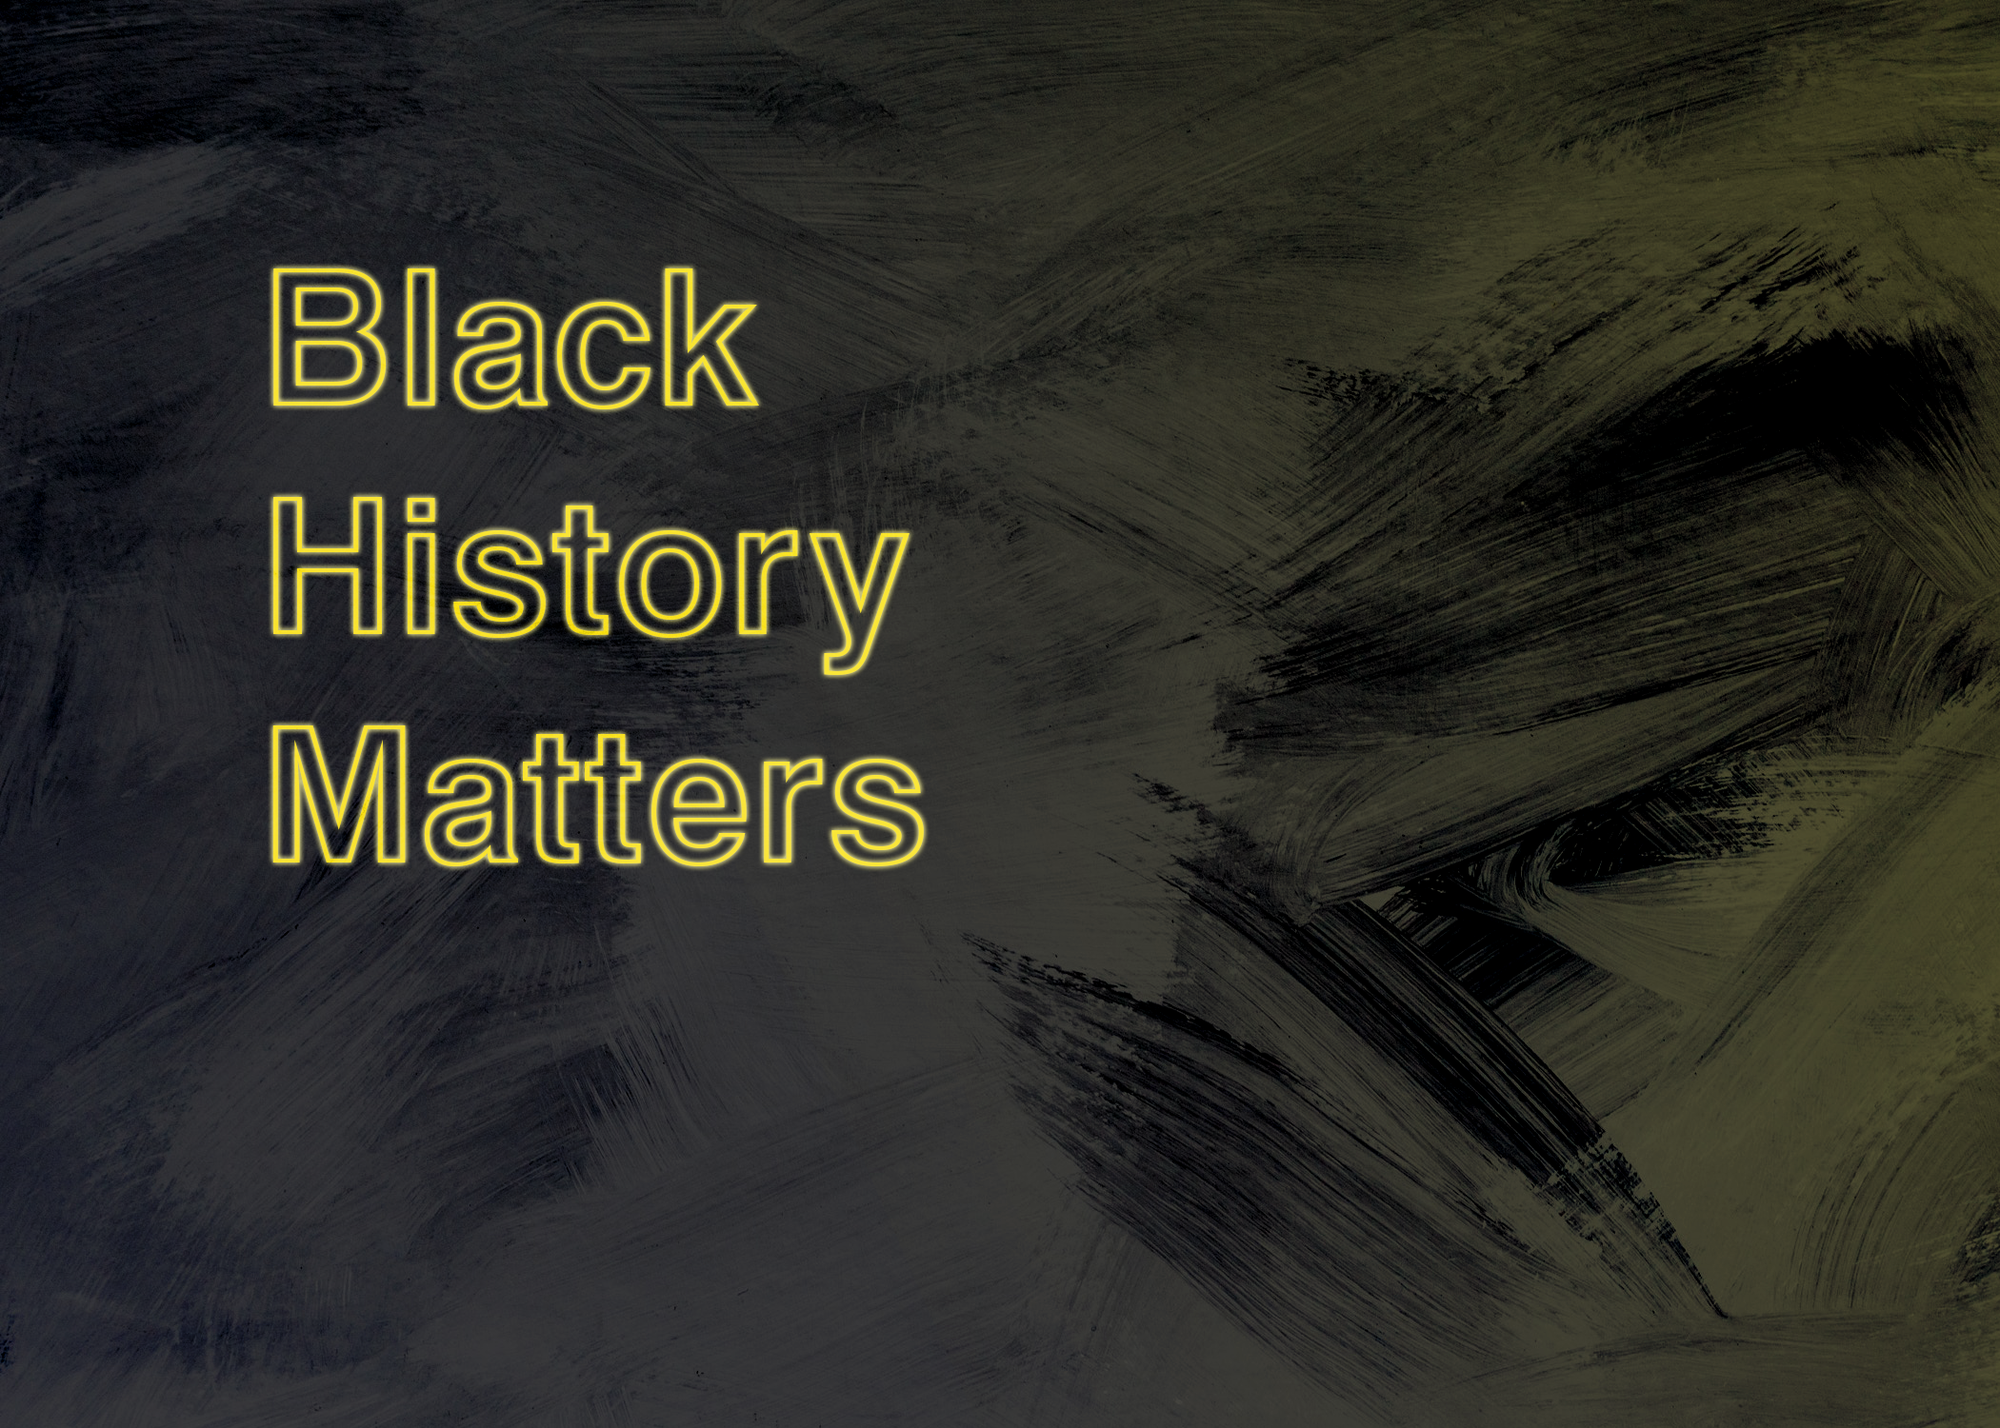 A calendar advertisement called Black History Matters